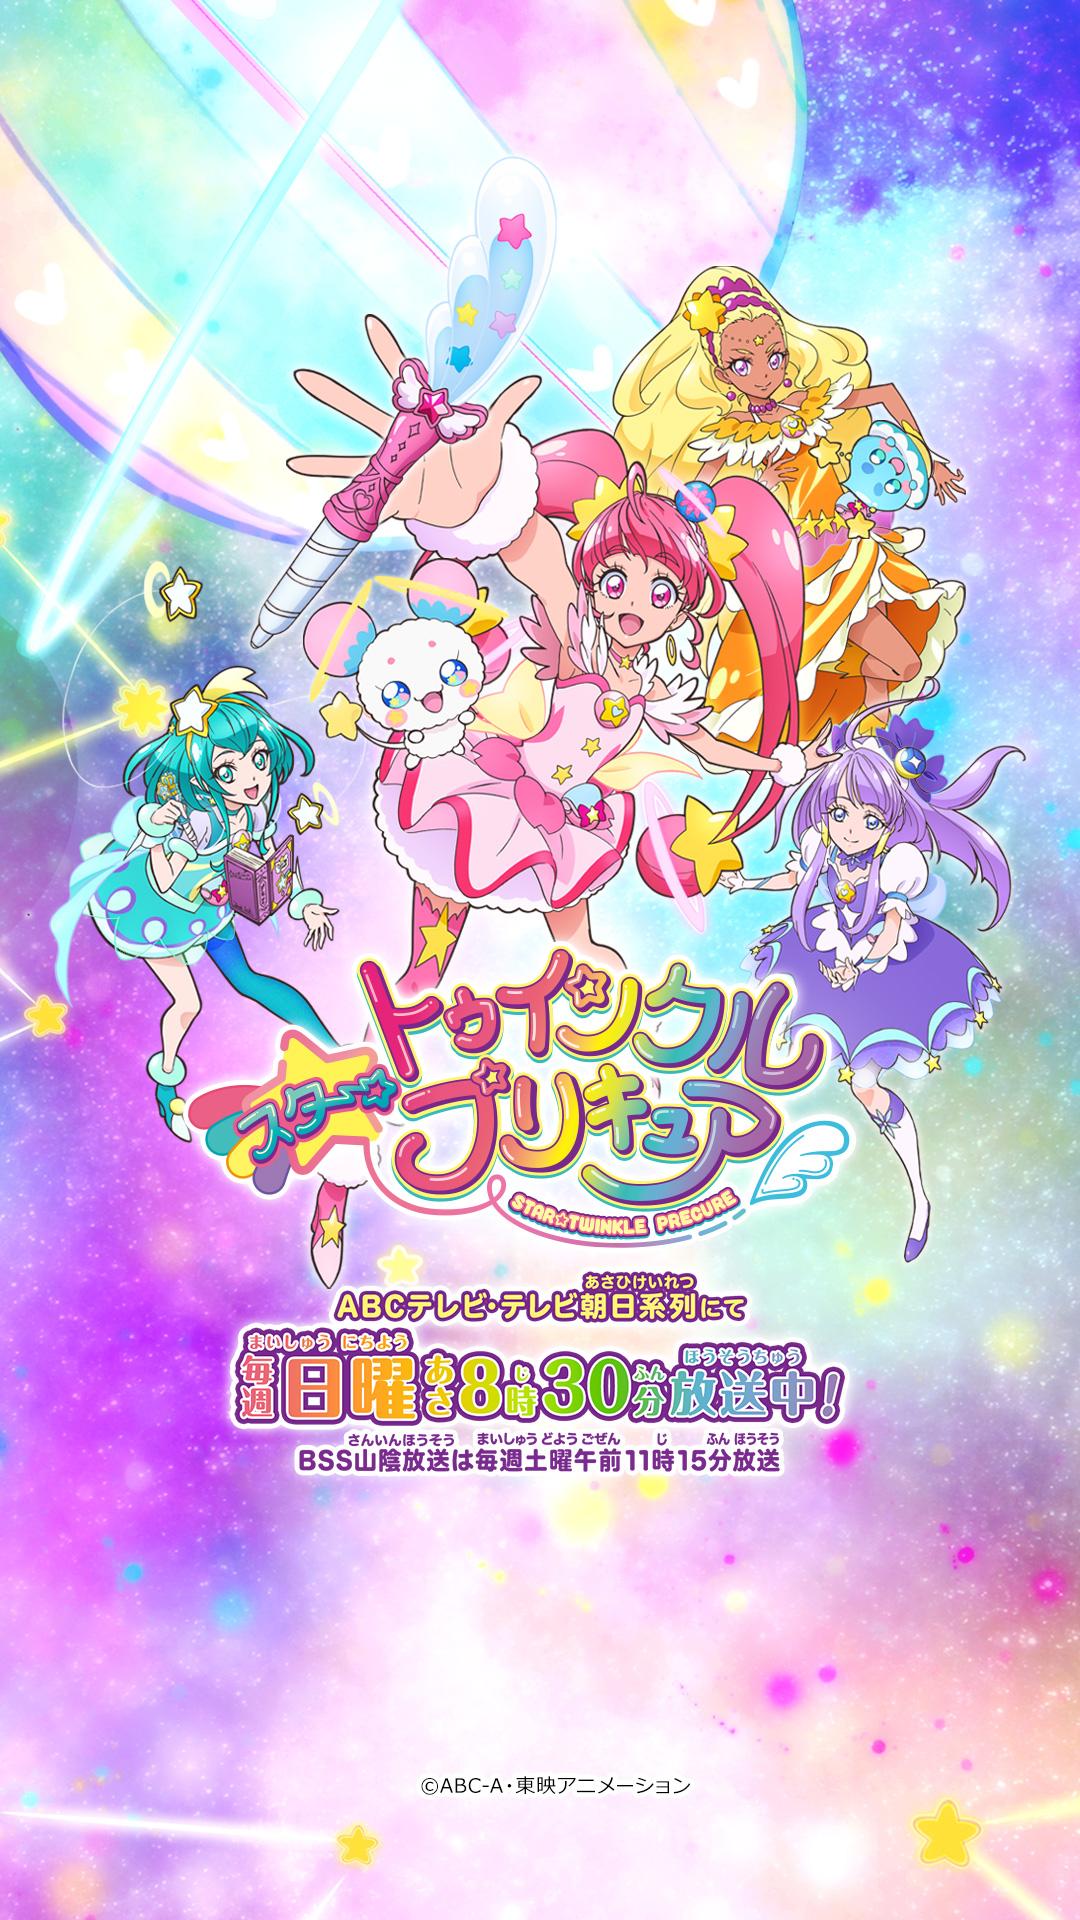 Star☆Twinkle Precure Phone Обои